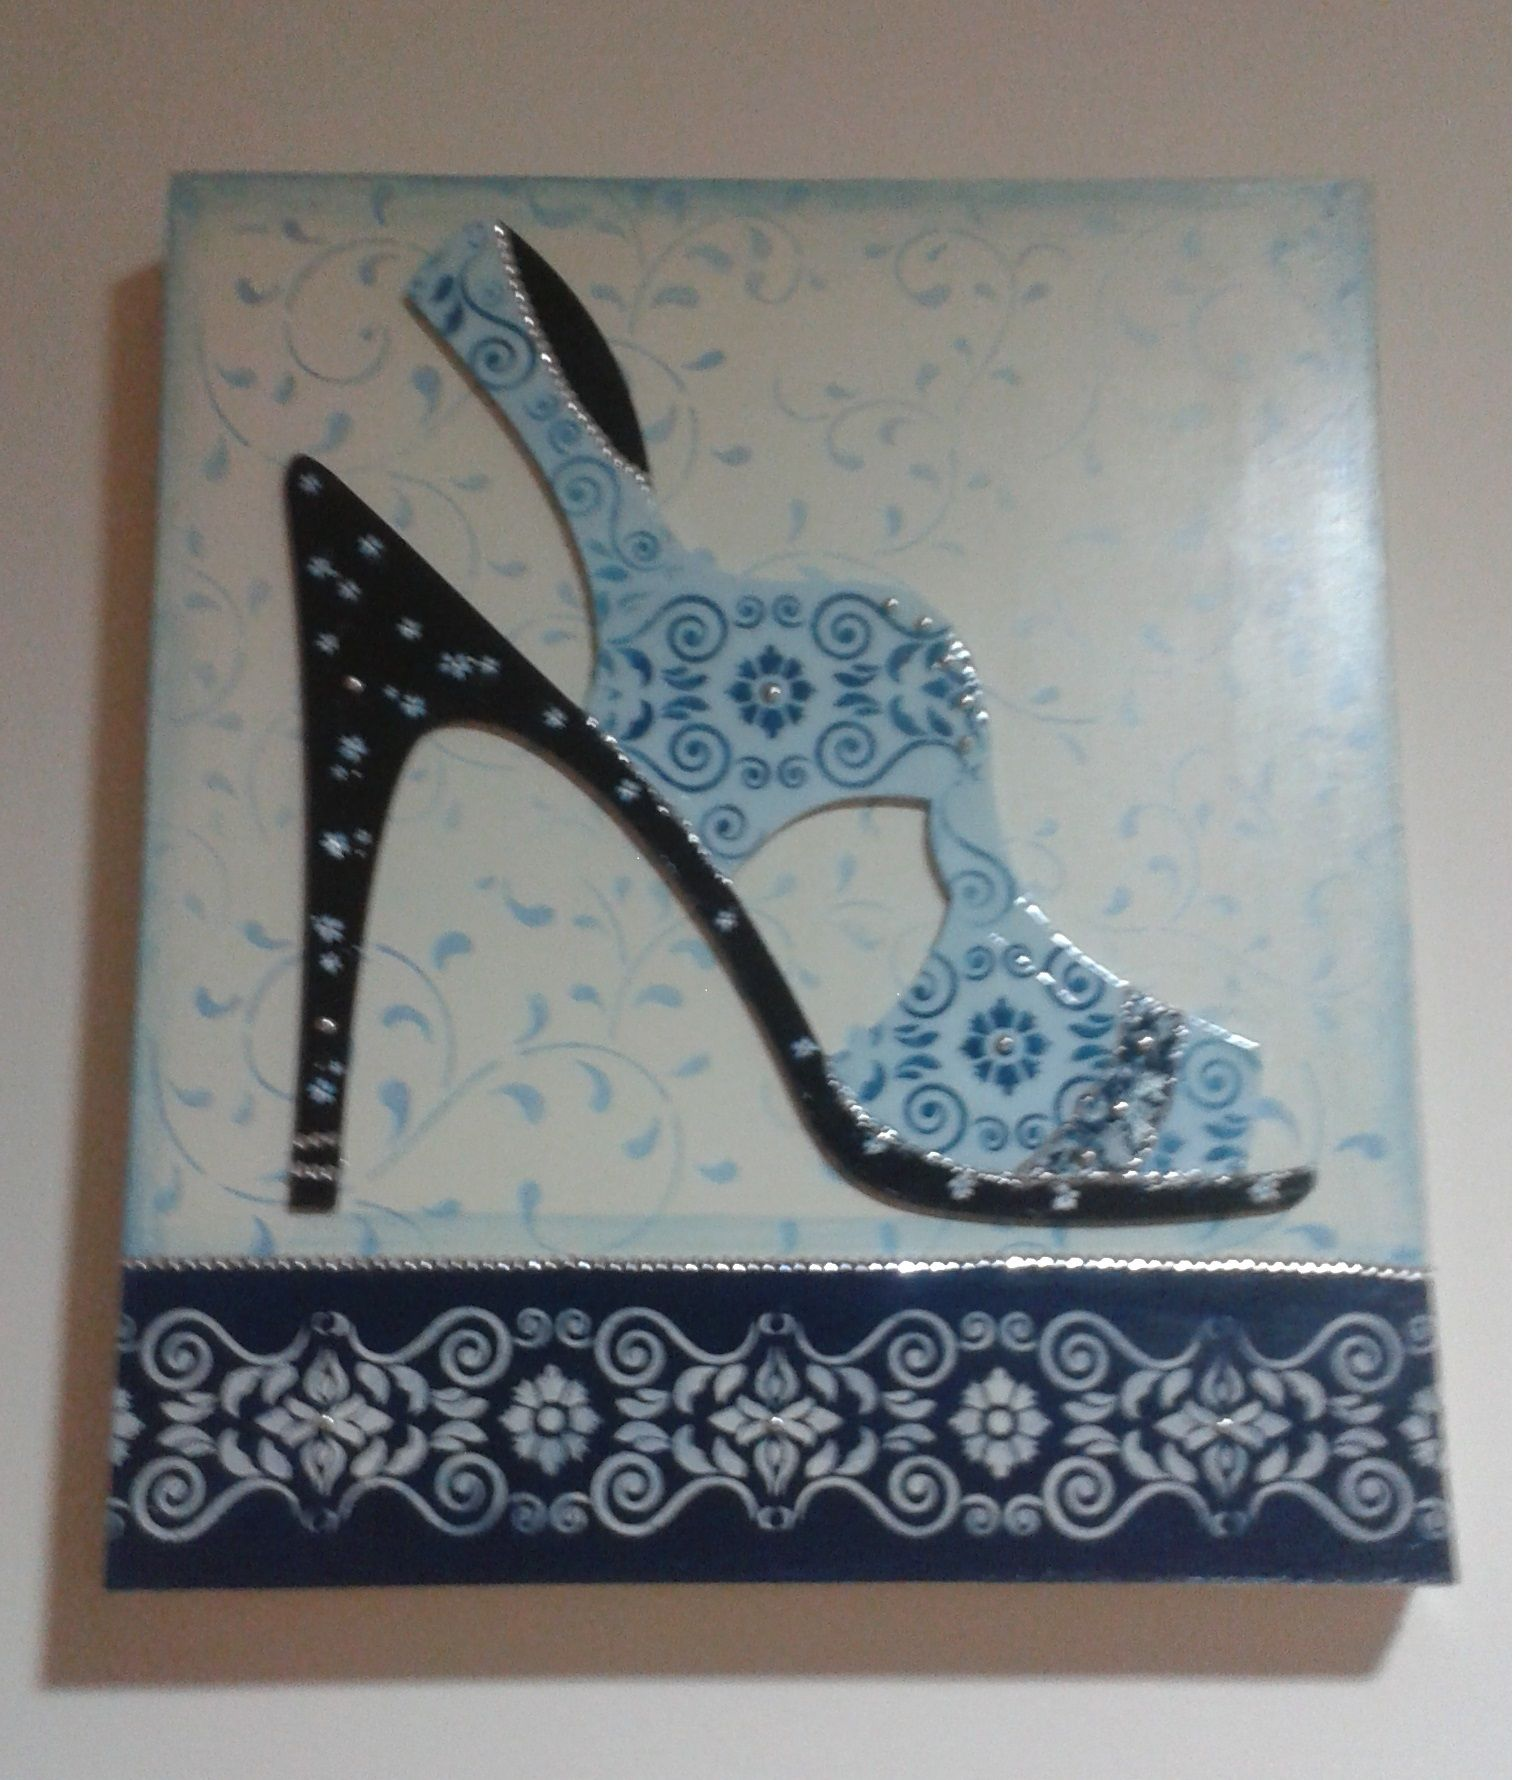 zapato n4